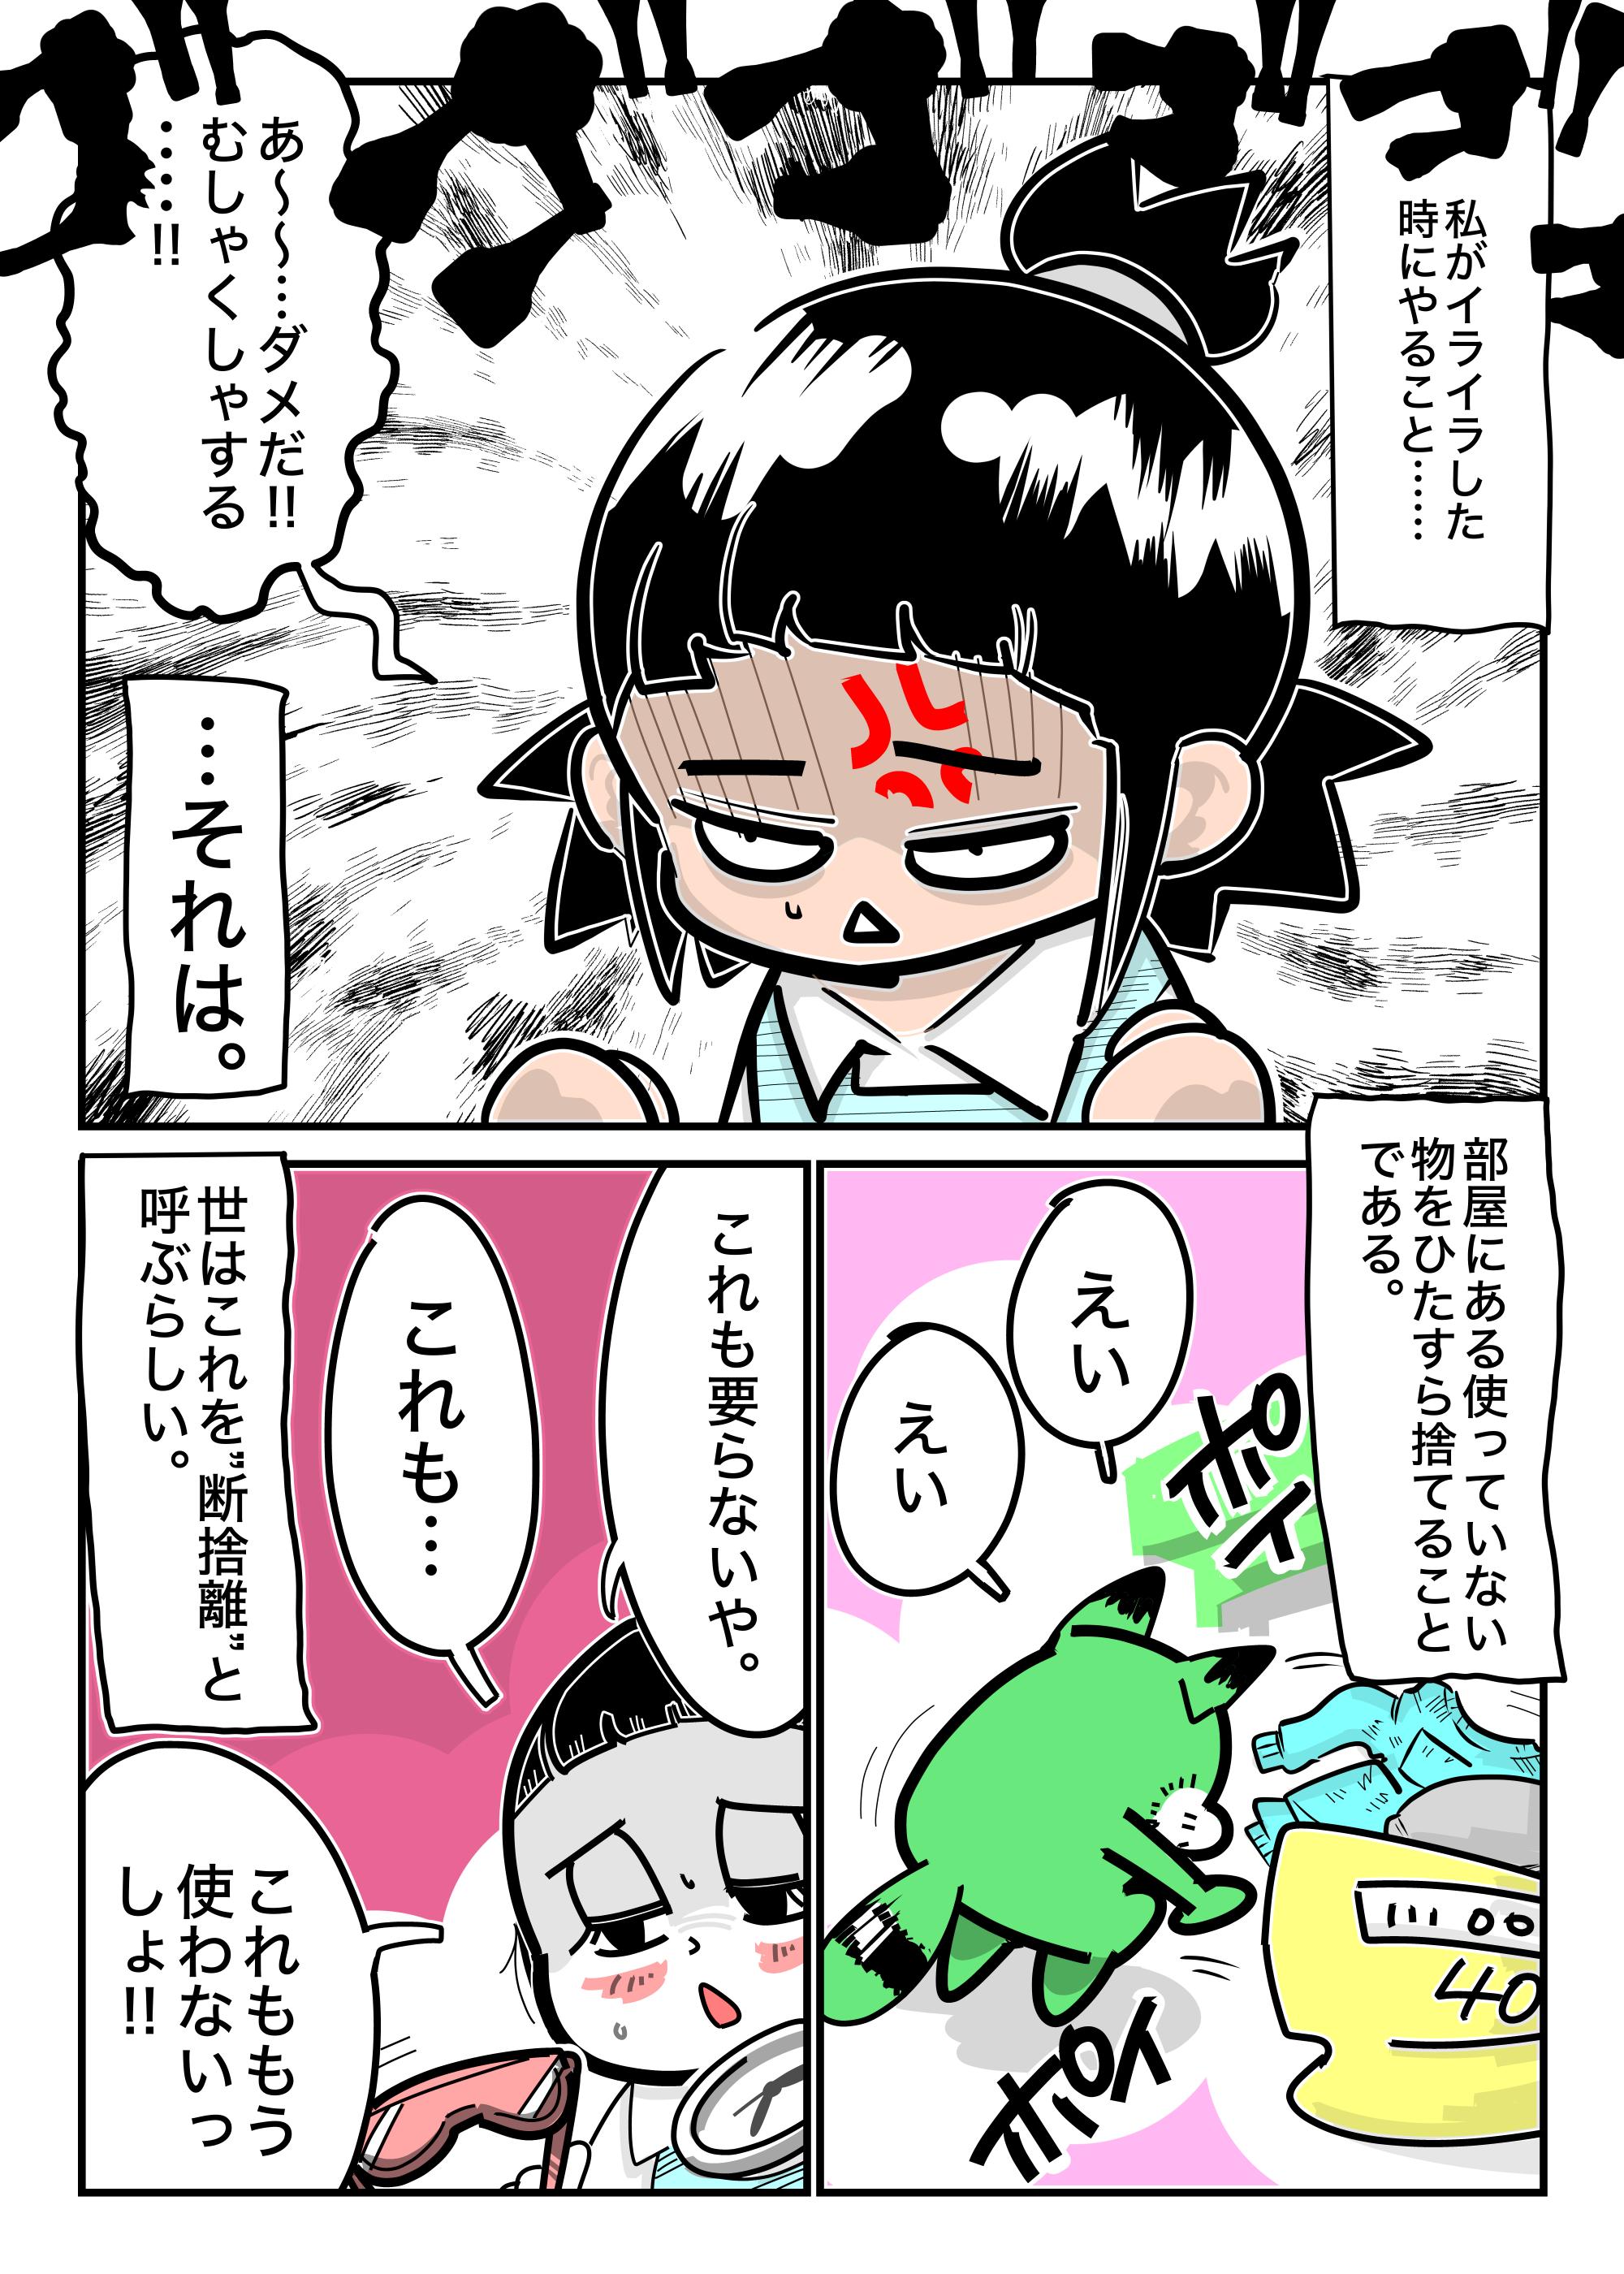 f:id:terashimaru117:20210911051647p:plain